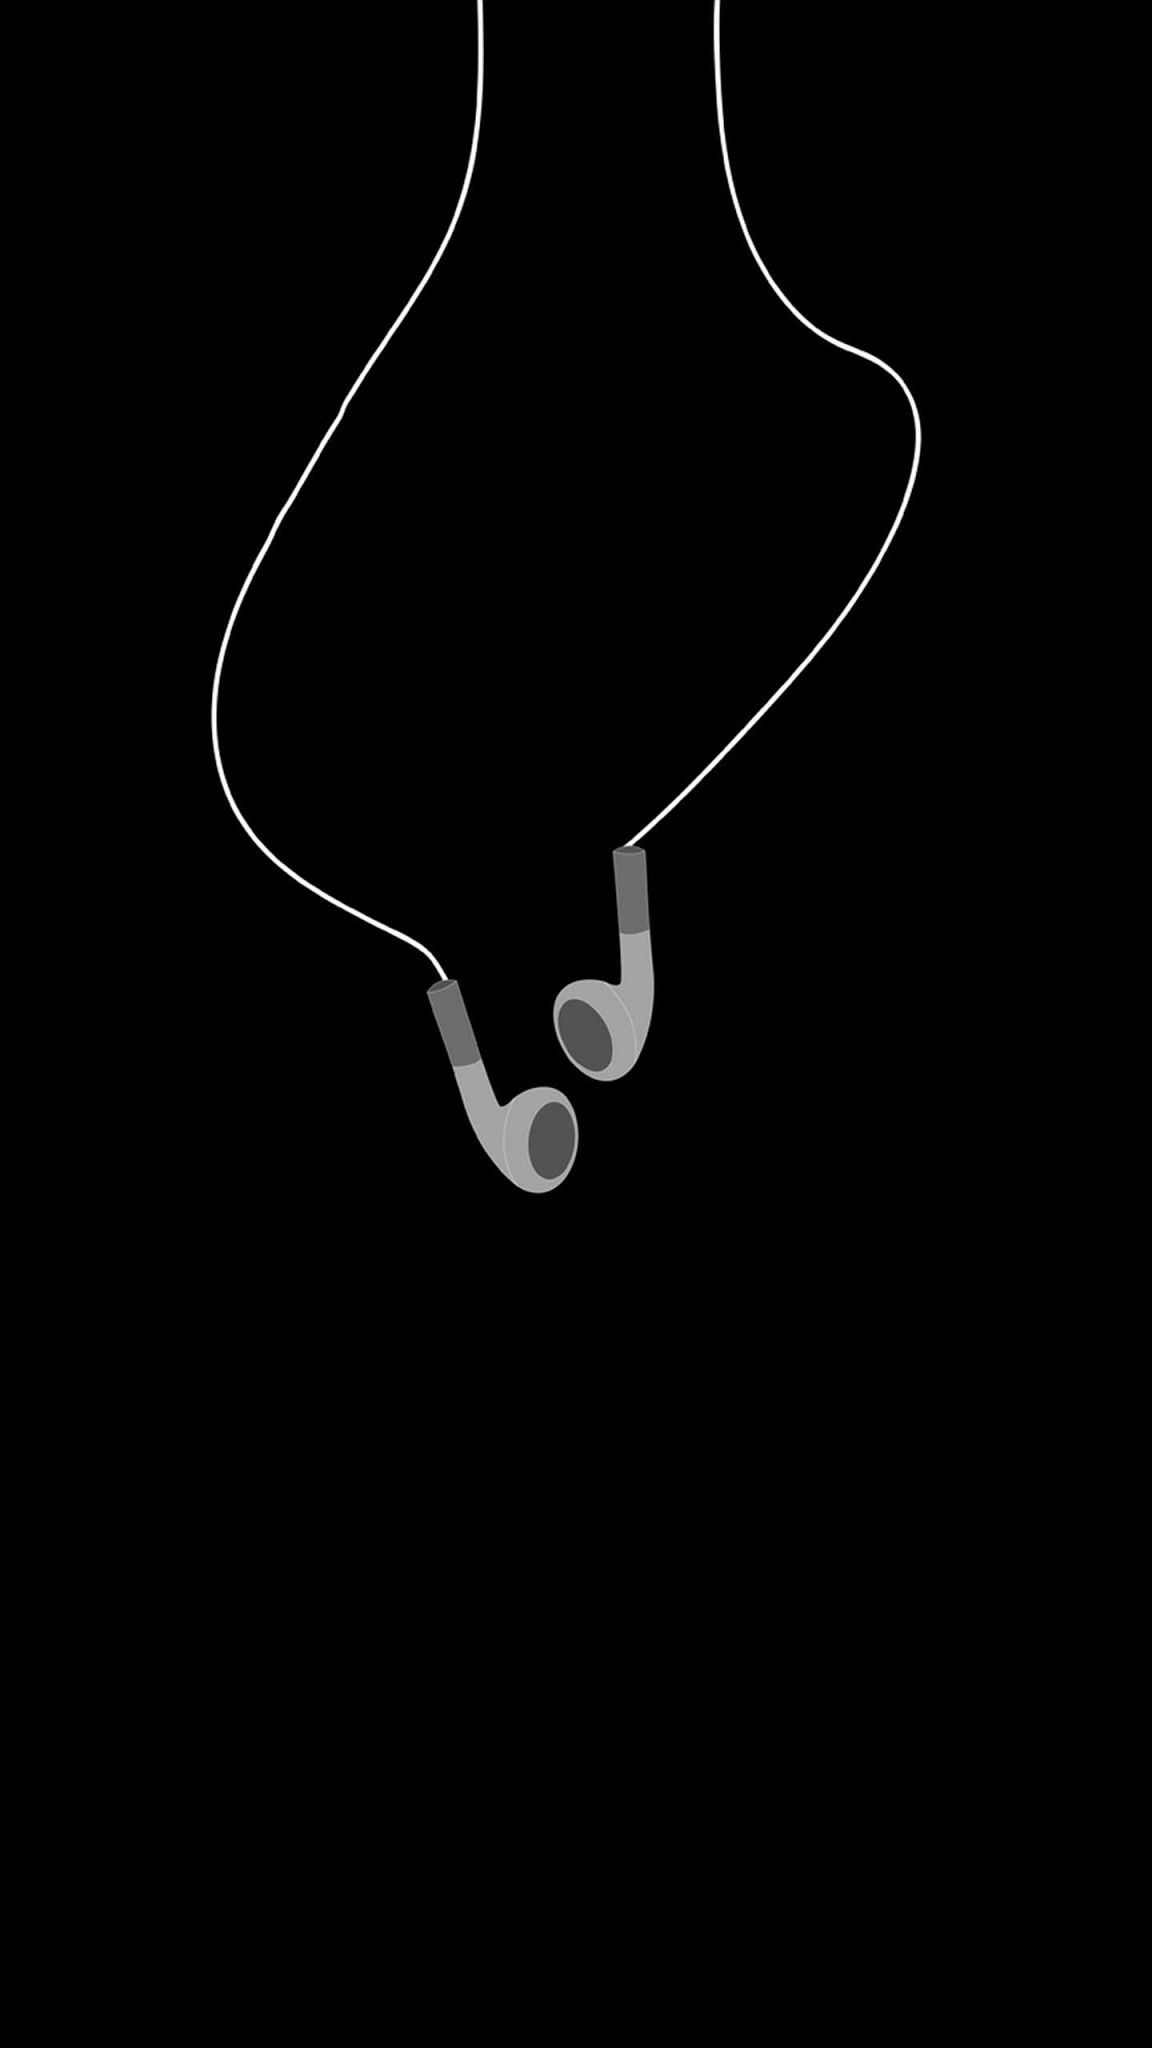 Headphones Wallpaper Black Wallpaper Iphone Black Aesthetic